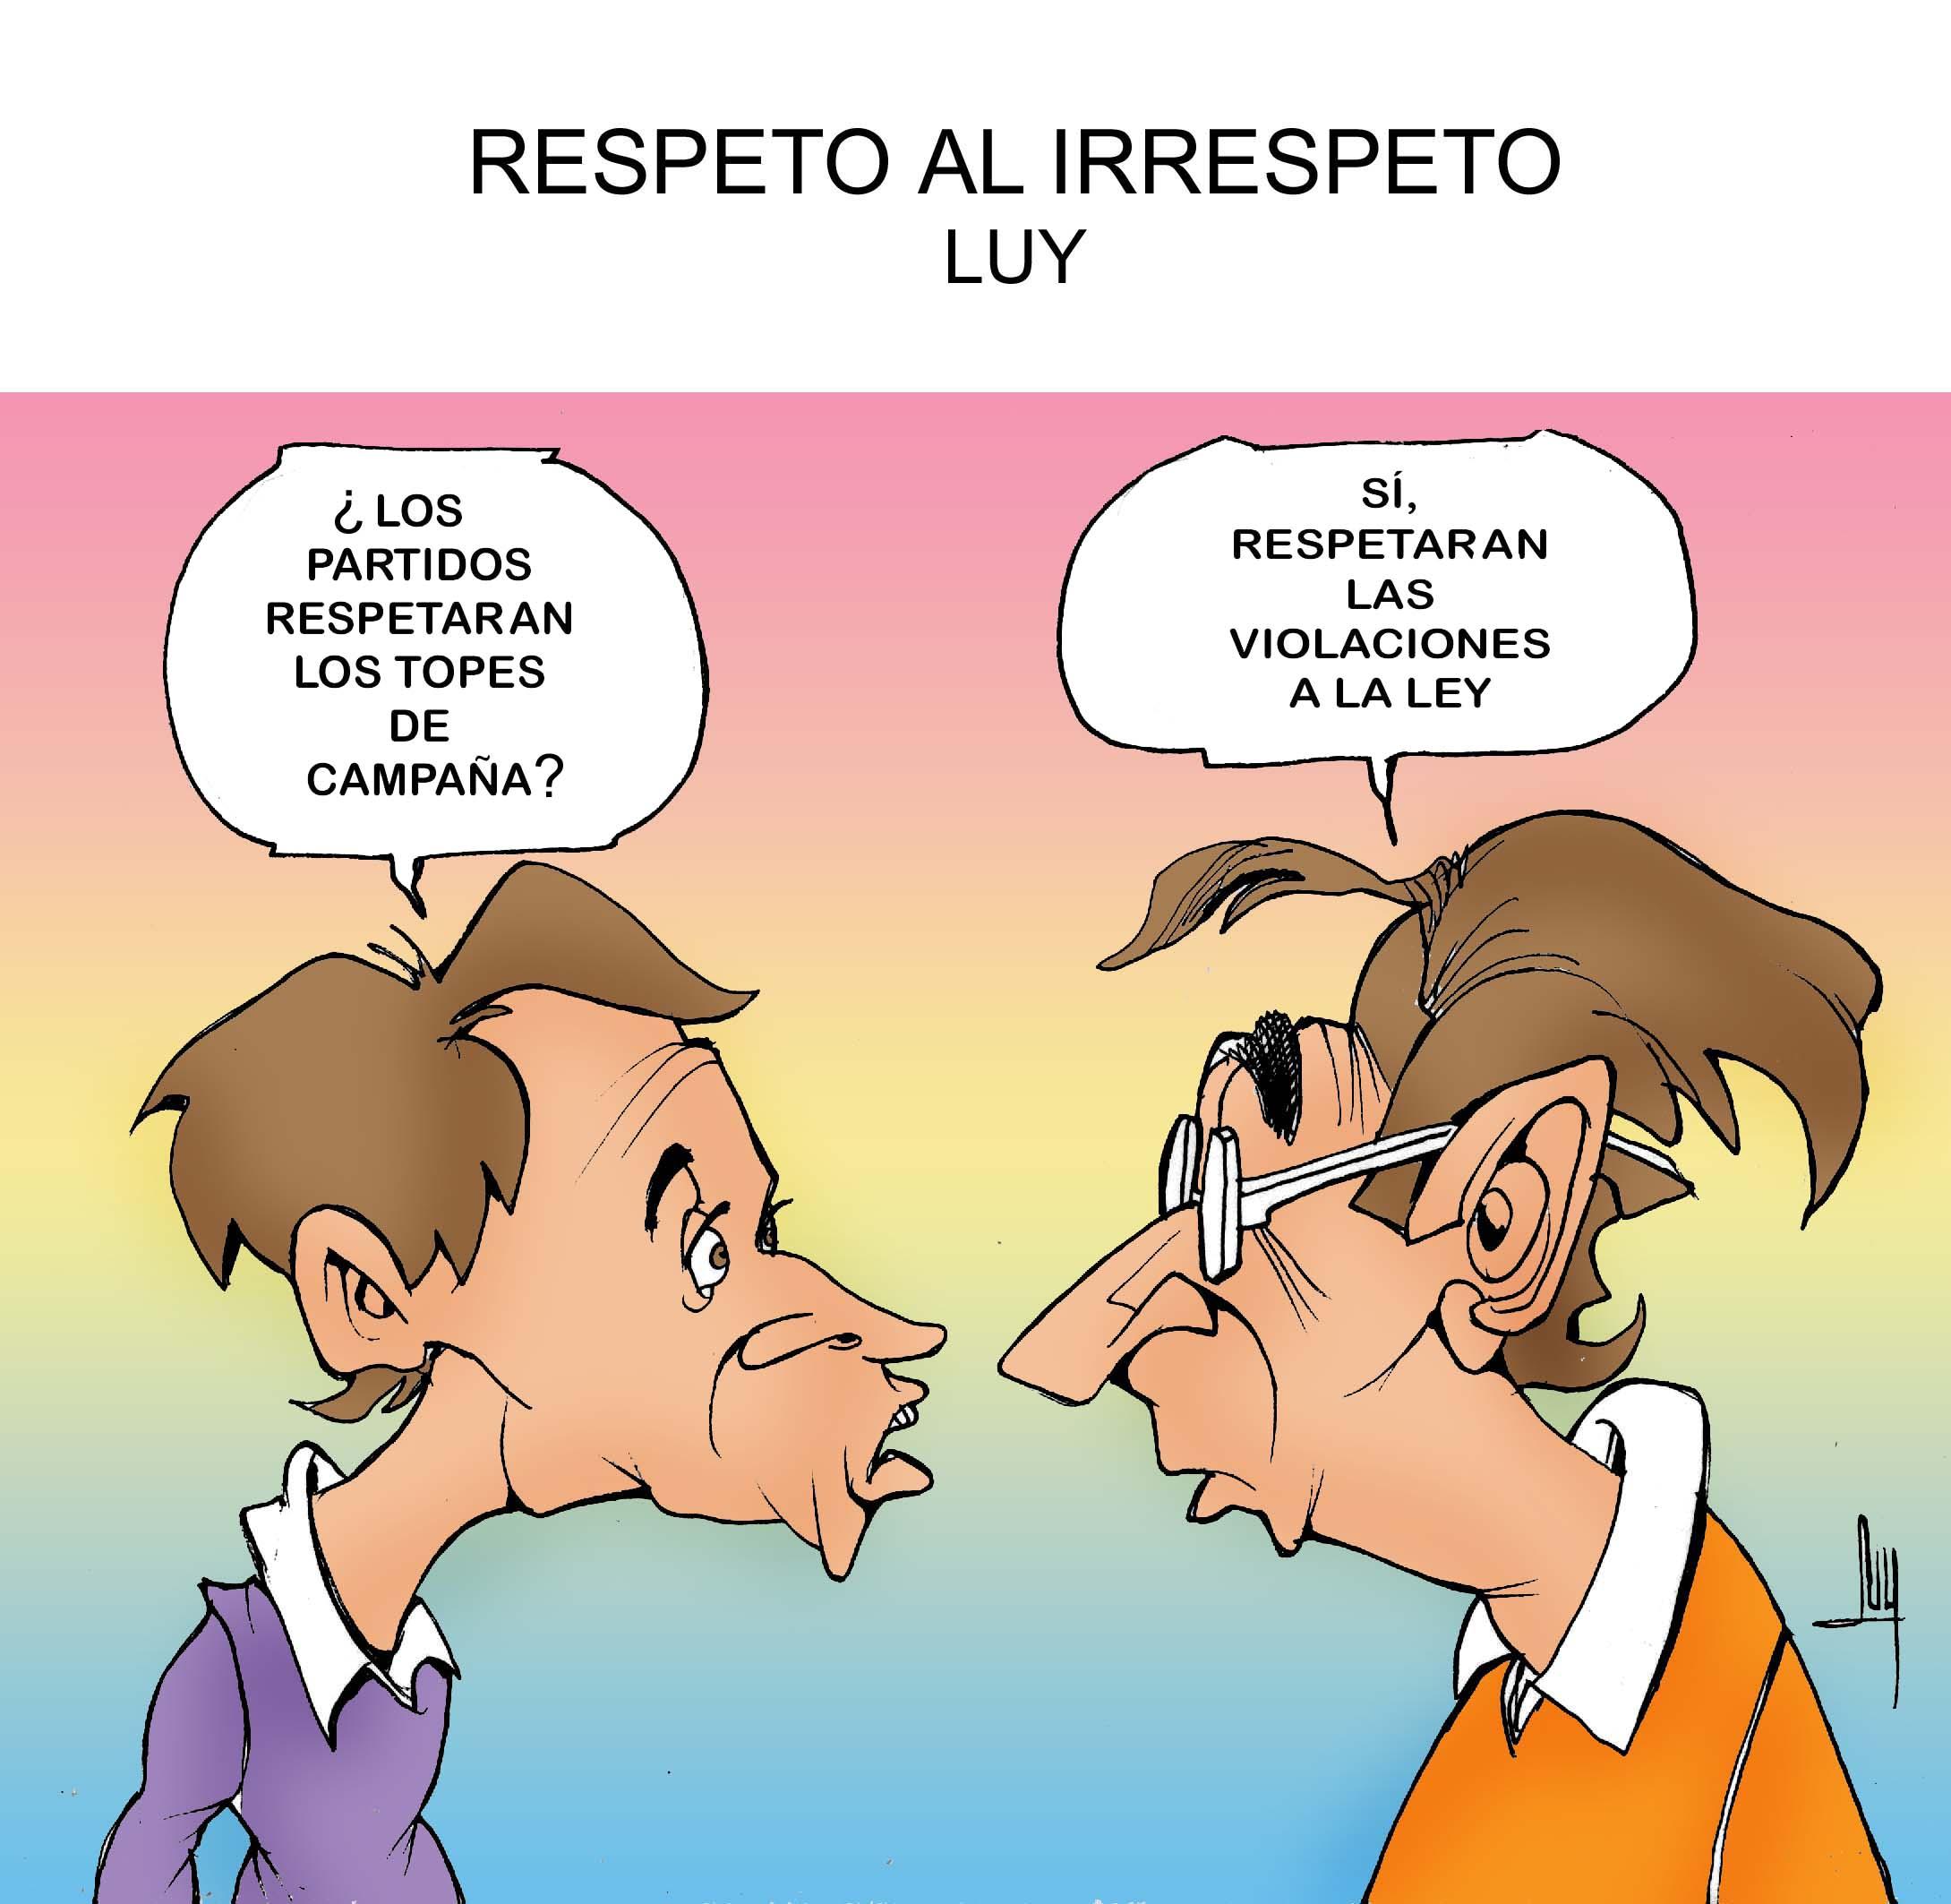 respeto-irrespeto